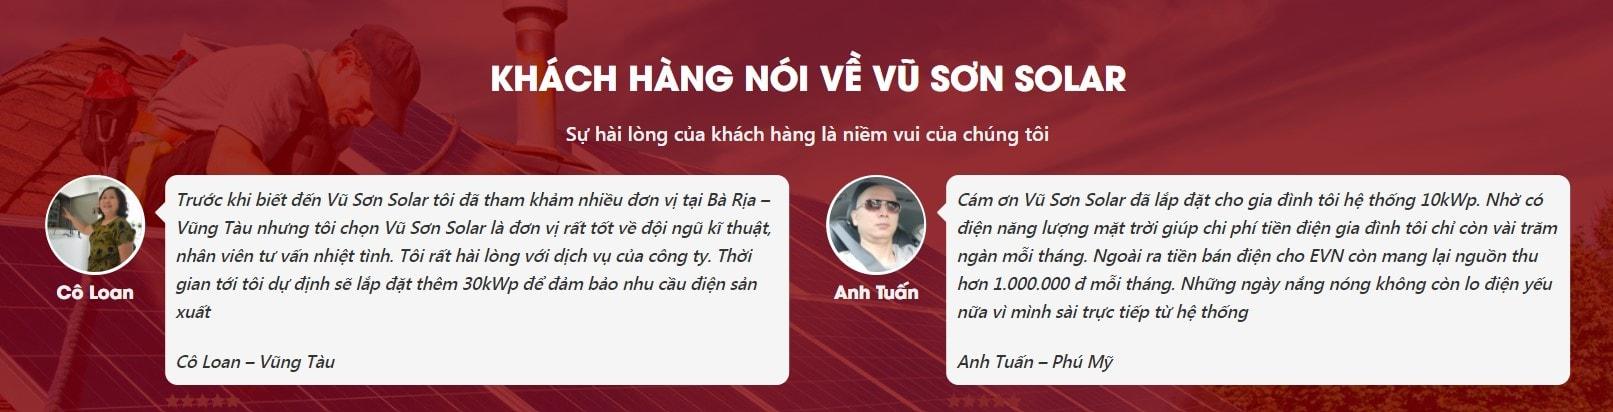 dien mat troi Quang Ngai 3 2